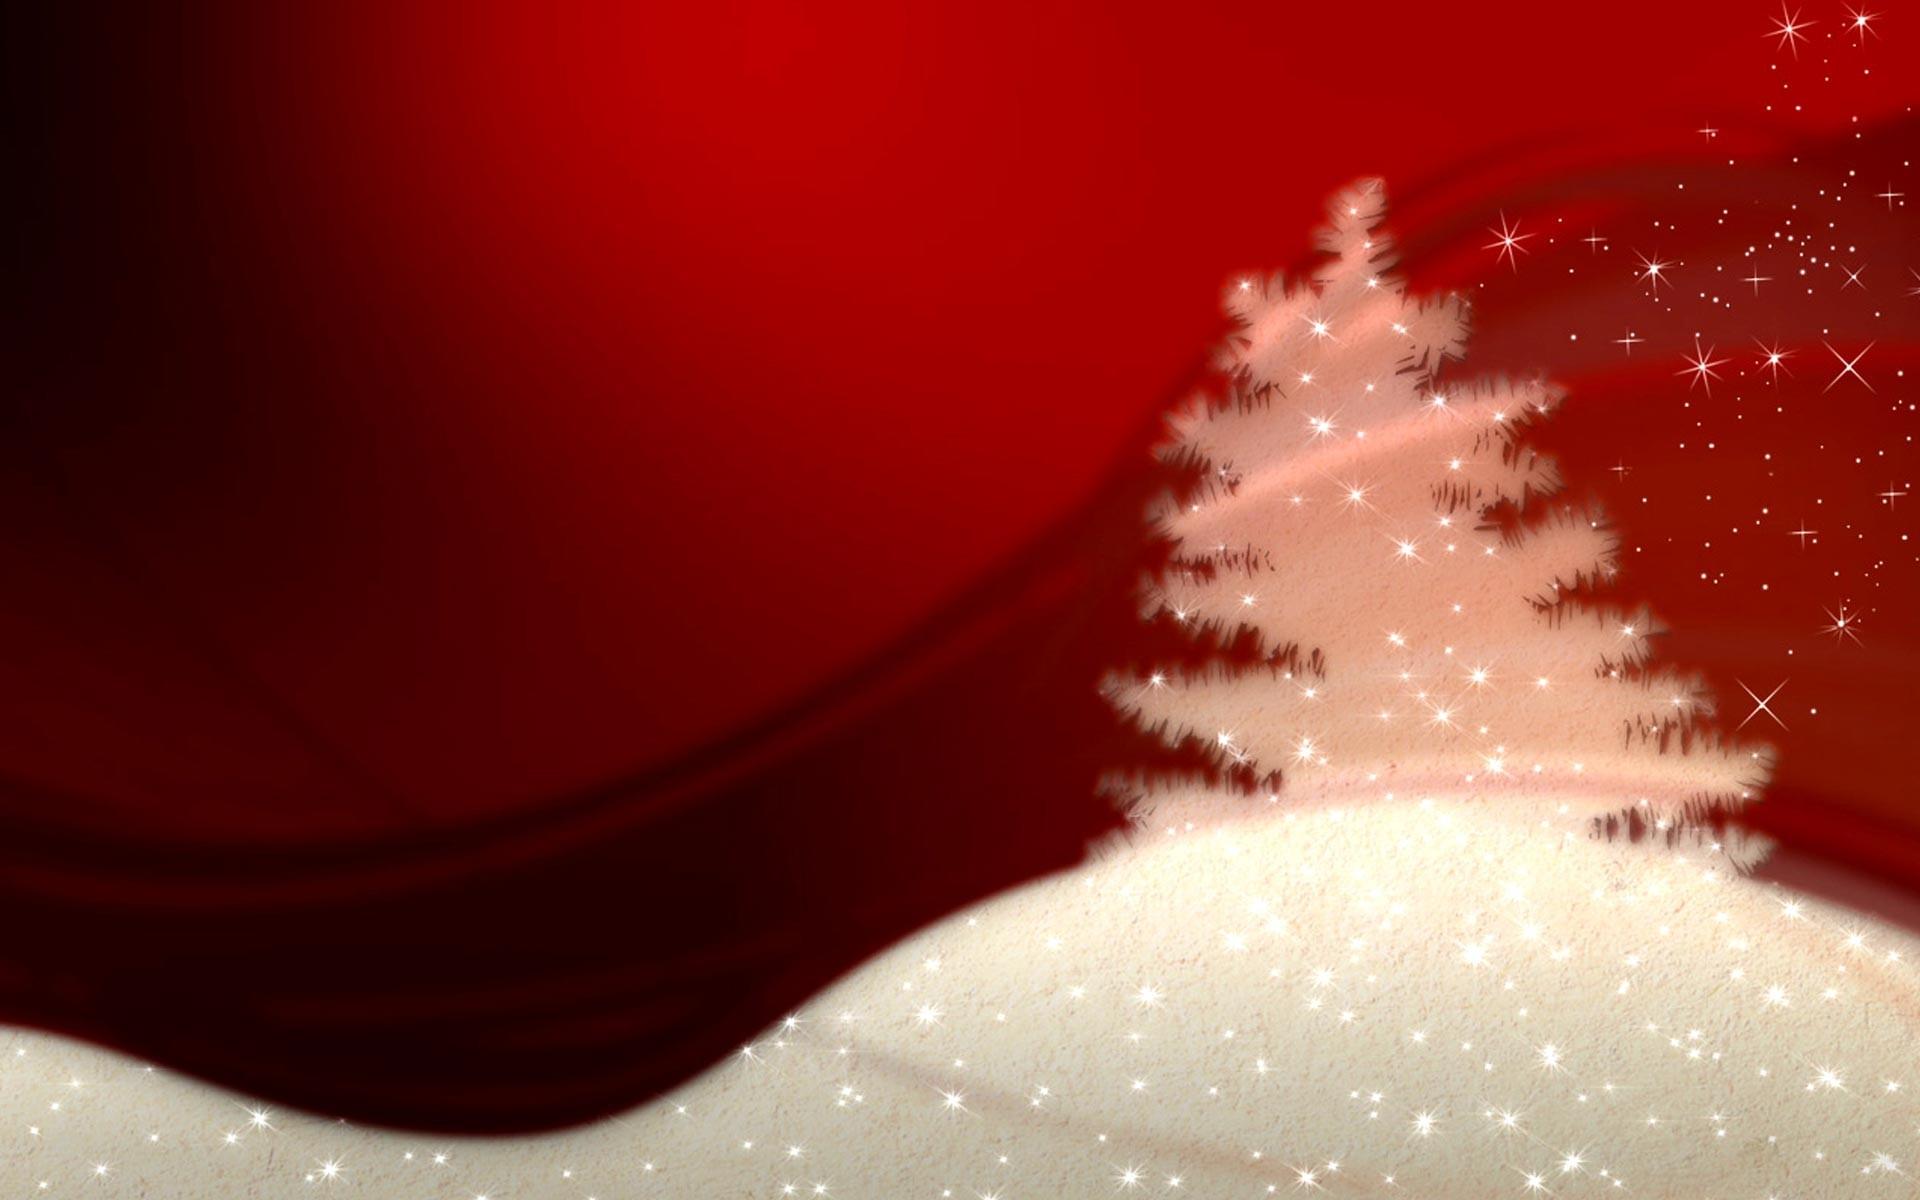 Best Merry Christmas Desktop Background for PC laptop Mac Happy